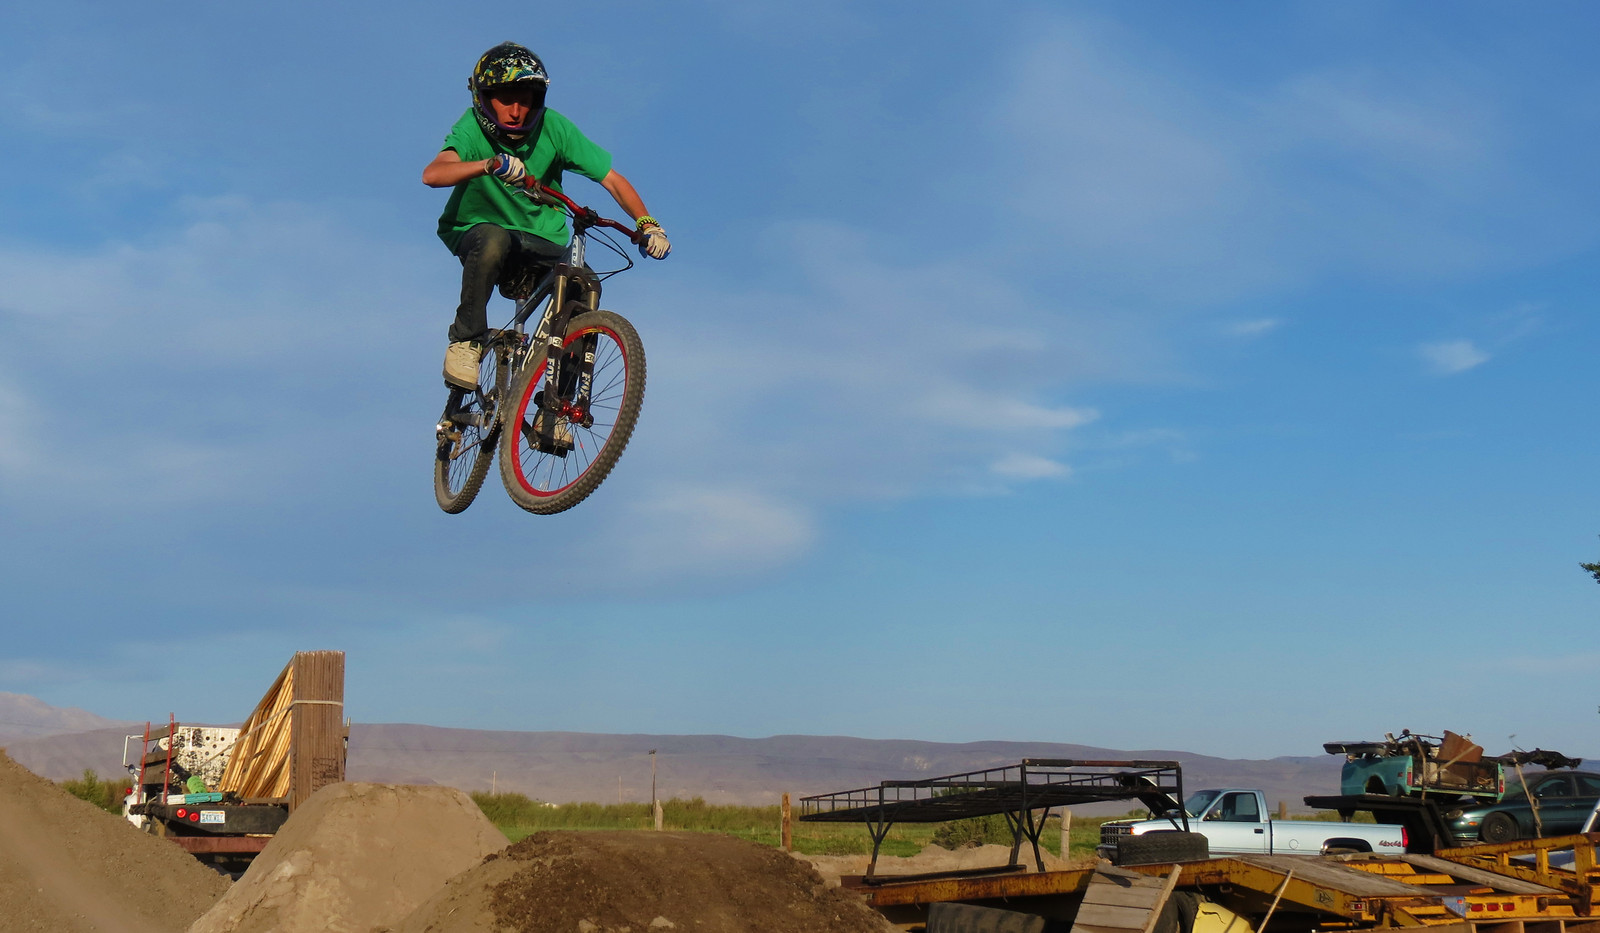 day 4 007 - Moosey - Mountain Biking Pictures - Vital MTB